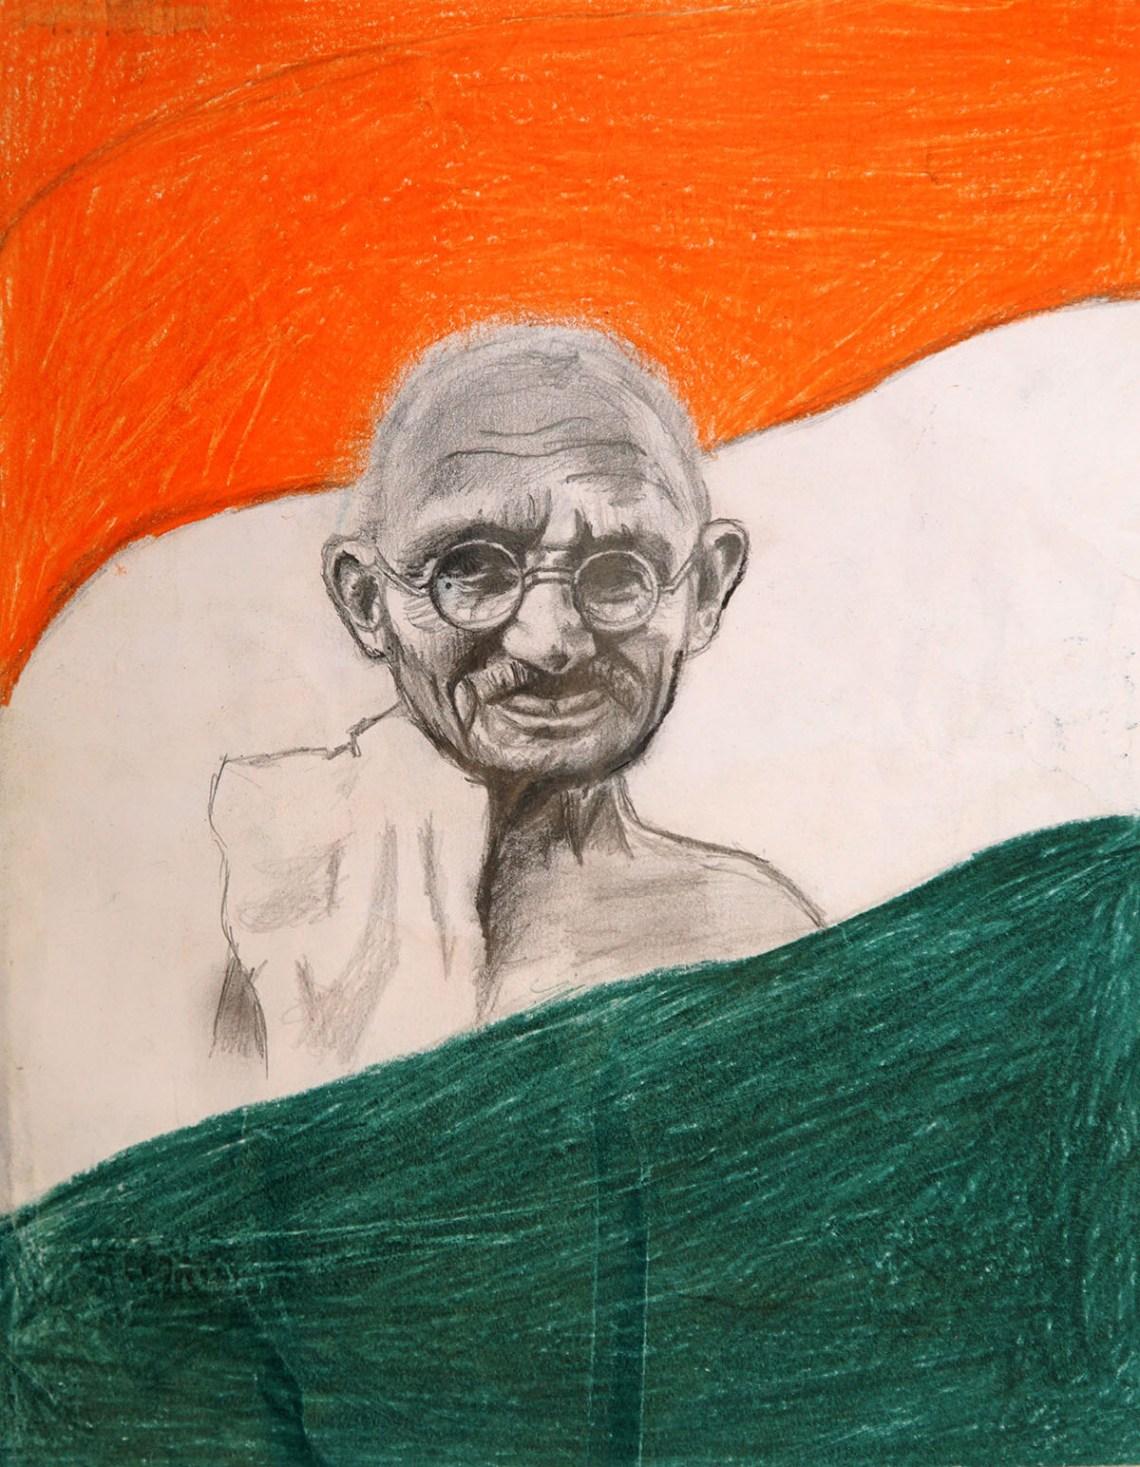 Matama Gandhi painting by child artist Vijayashree Kakubal, medal winner in Khula Aasmaan children's painting competition